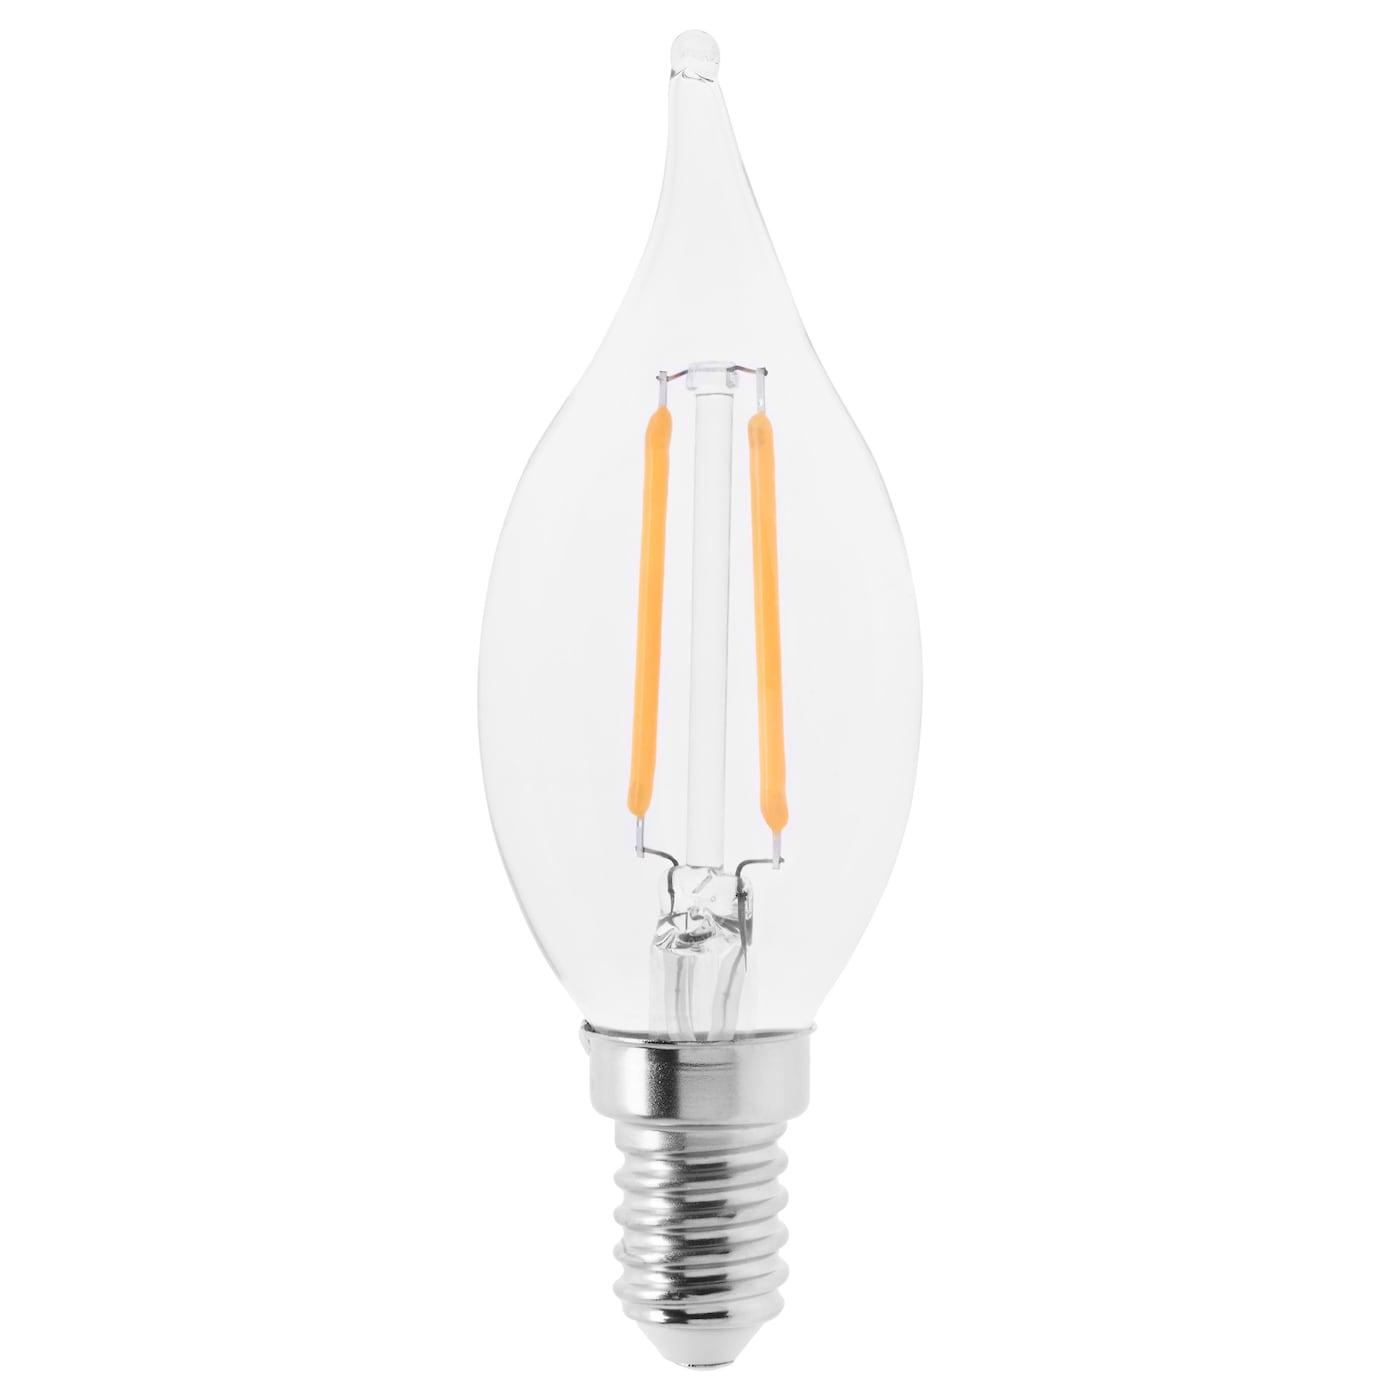 lunnom led bulb e14 200 lumen chandelier clear glass 35 mm ikea. Black Bedroom Furniture Sets. Home Design Ideas